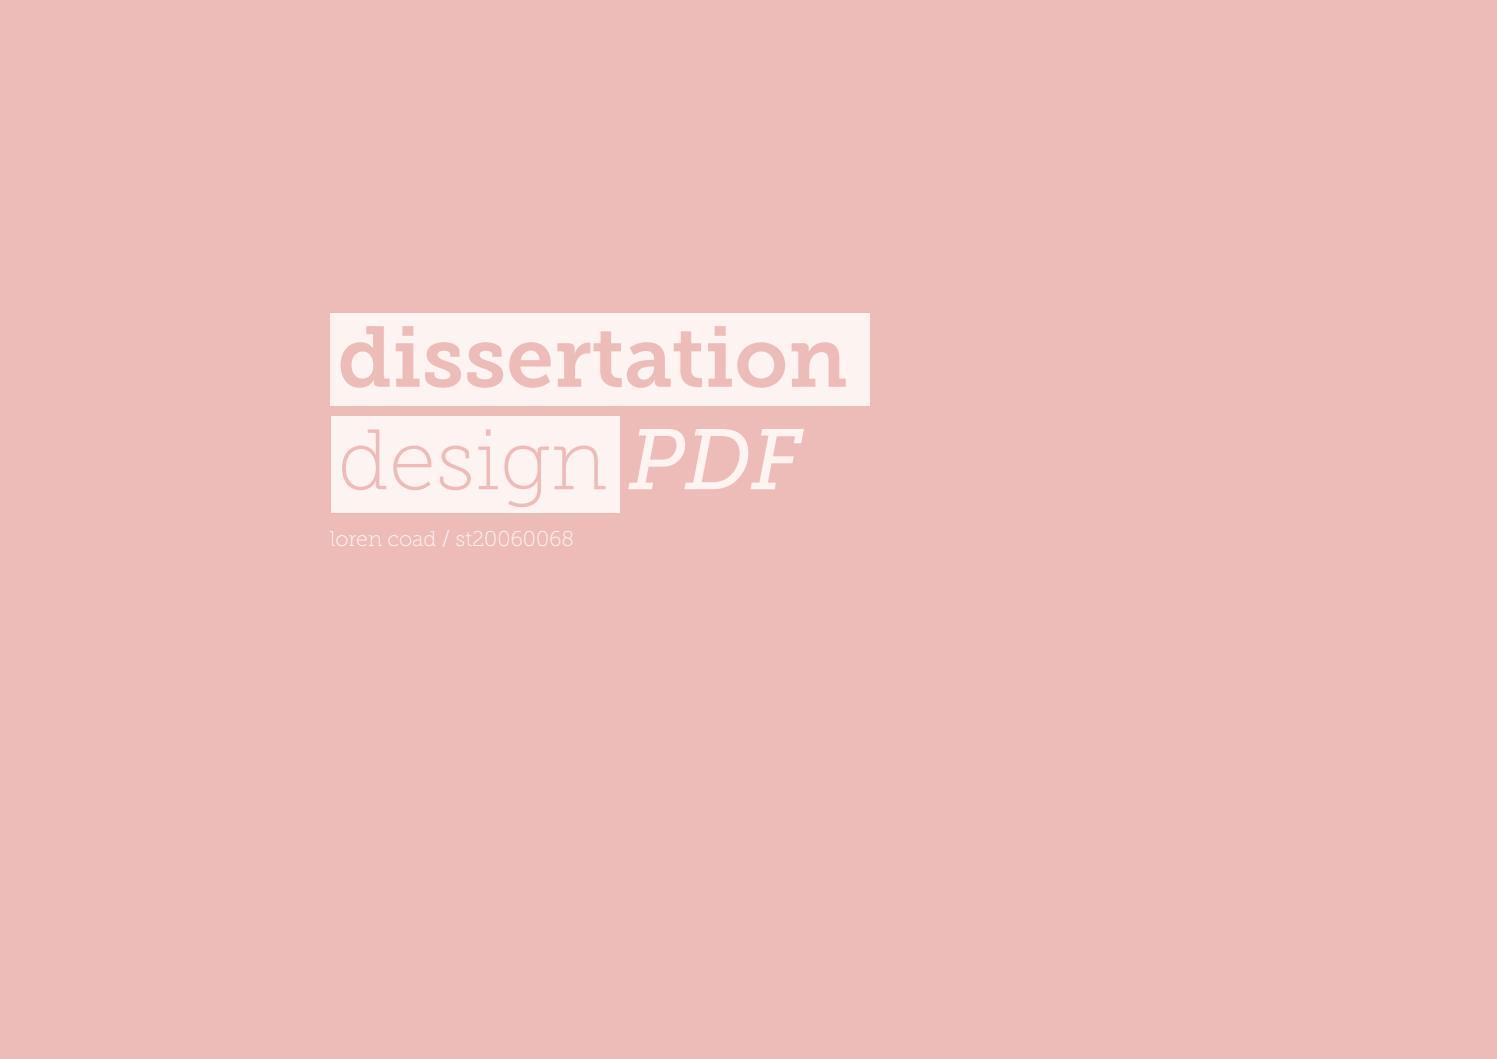 Dissertation proposal brand loyalty